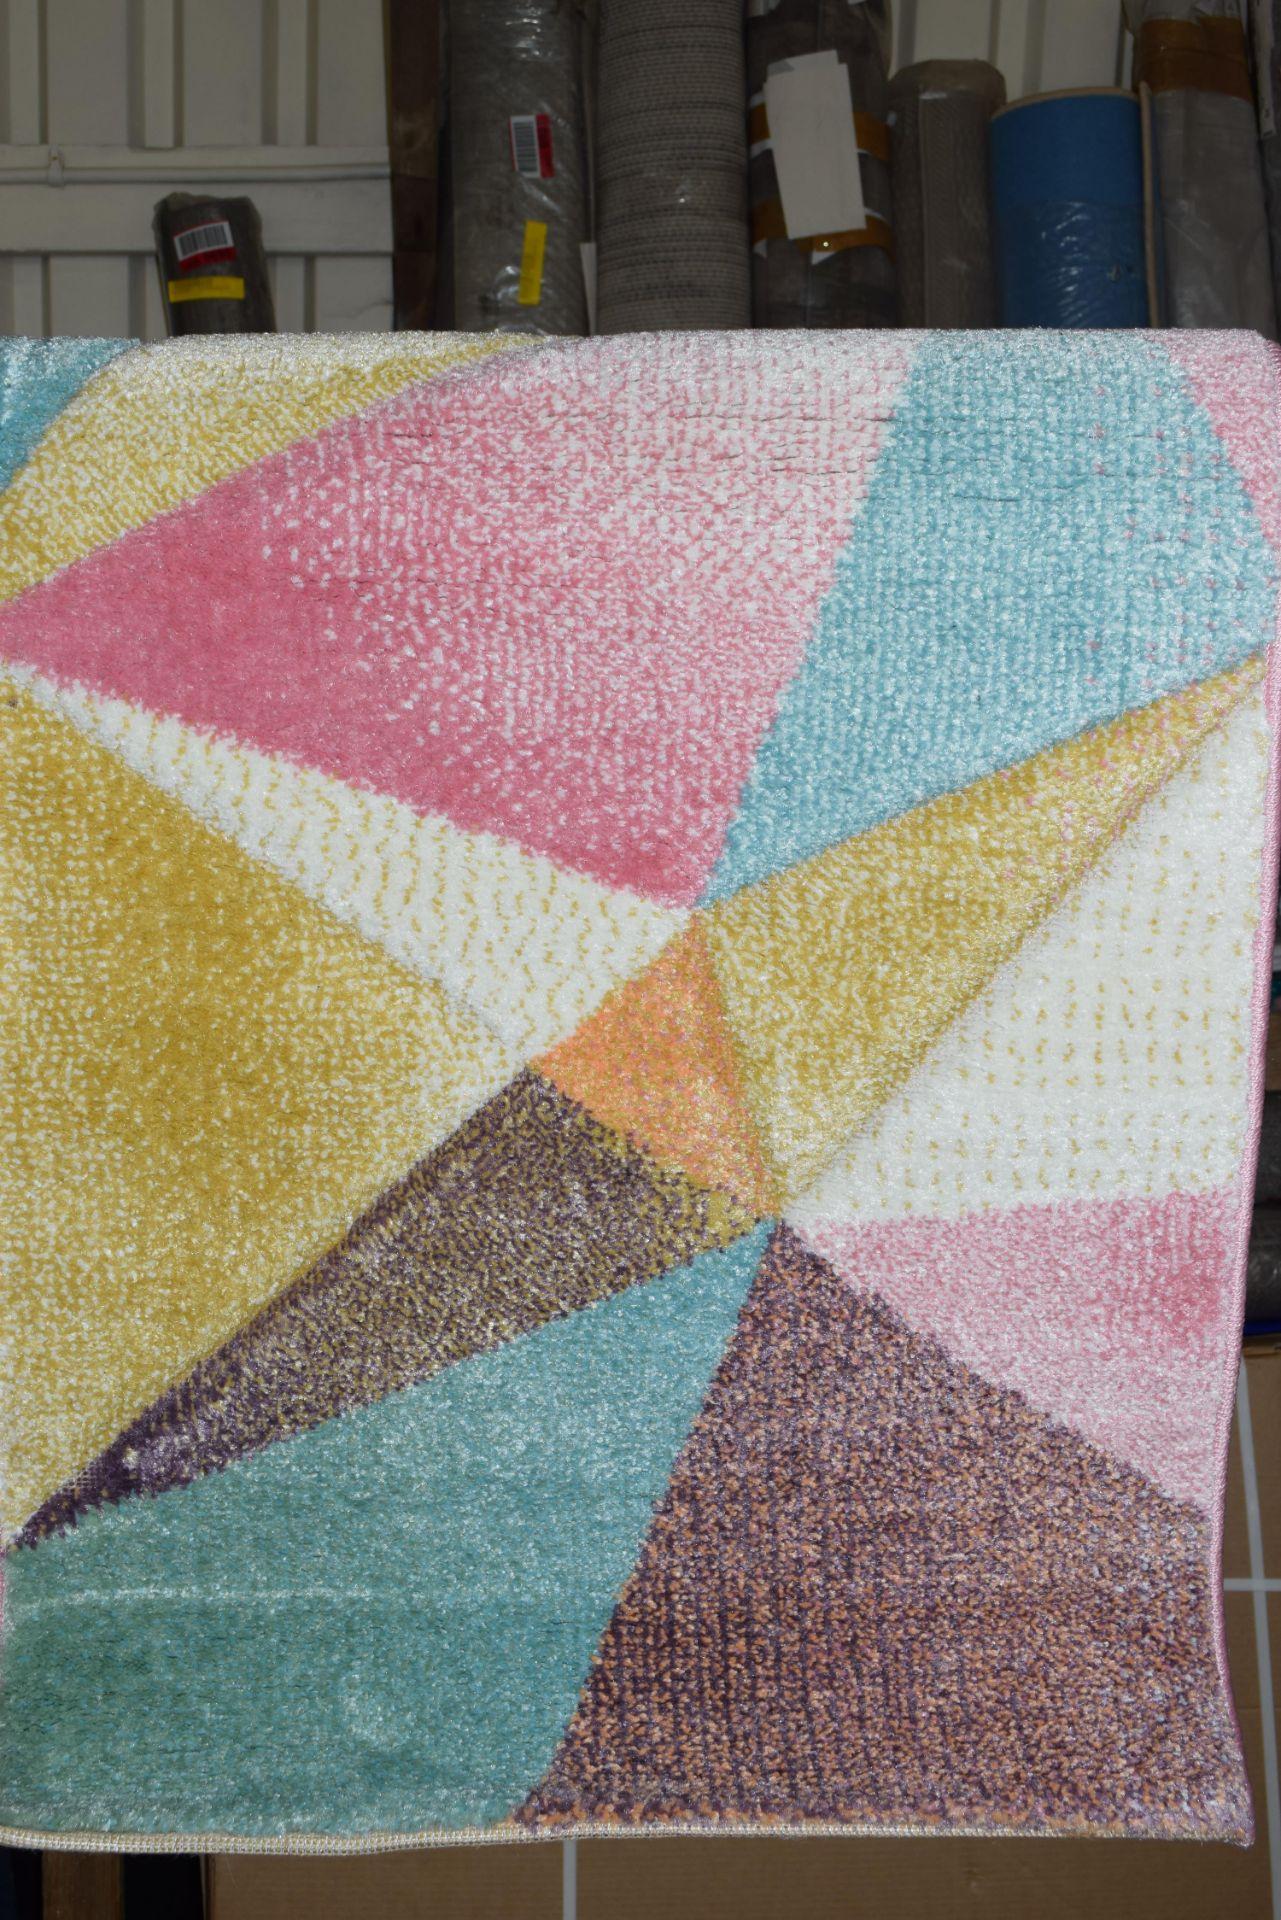 Kosi multicoloured Paco home rug, 60 x 100cm